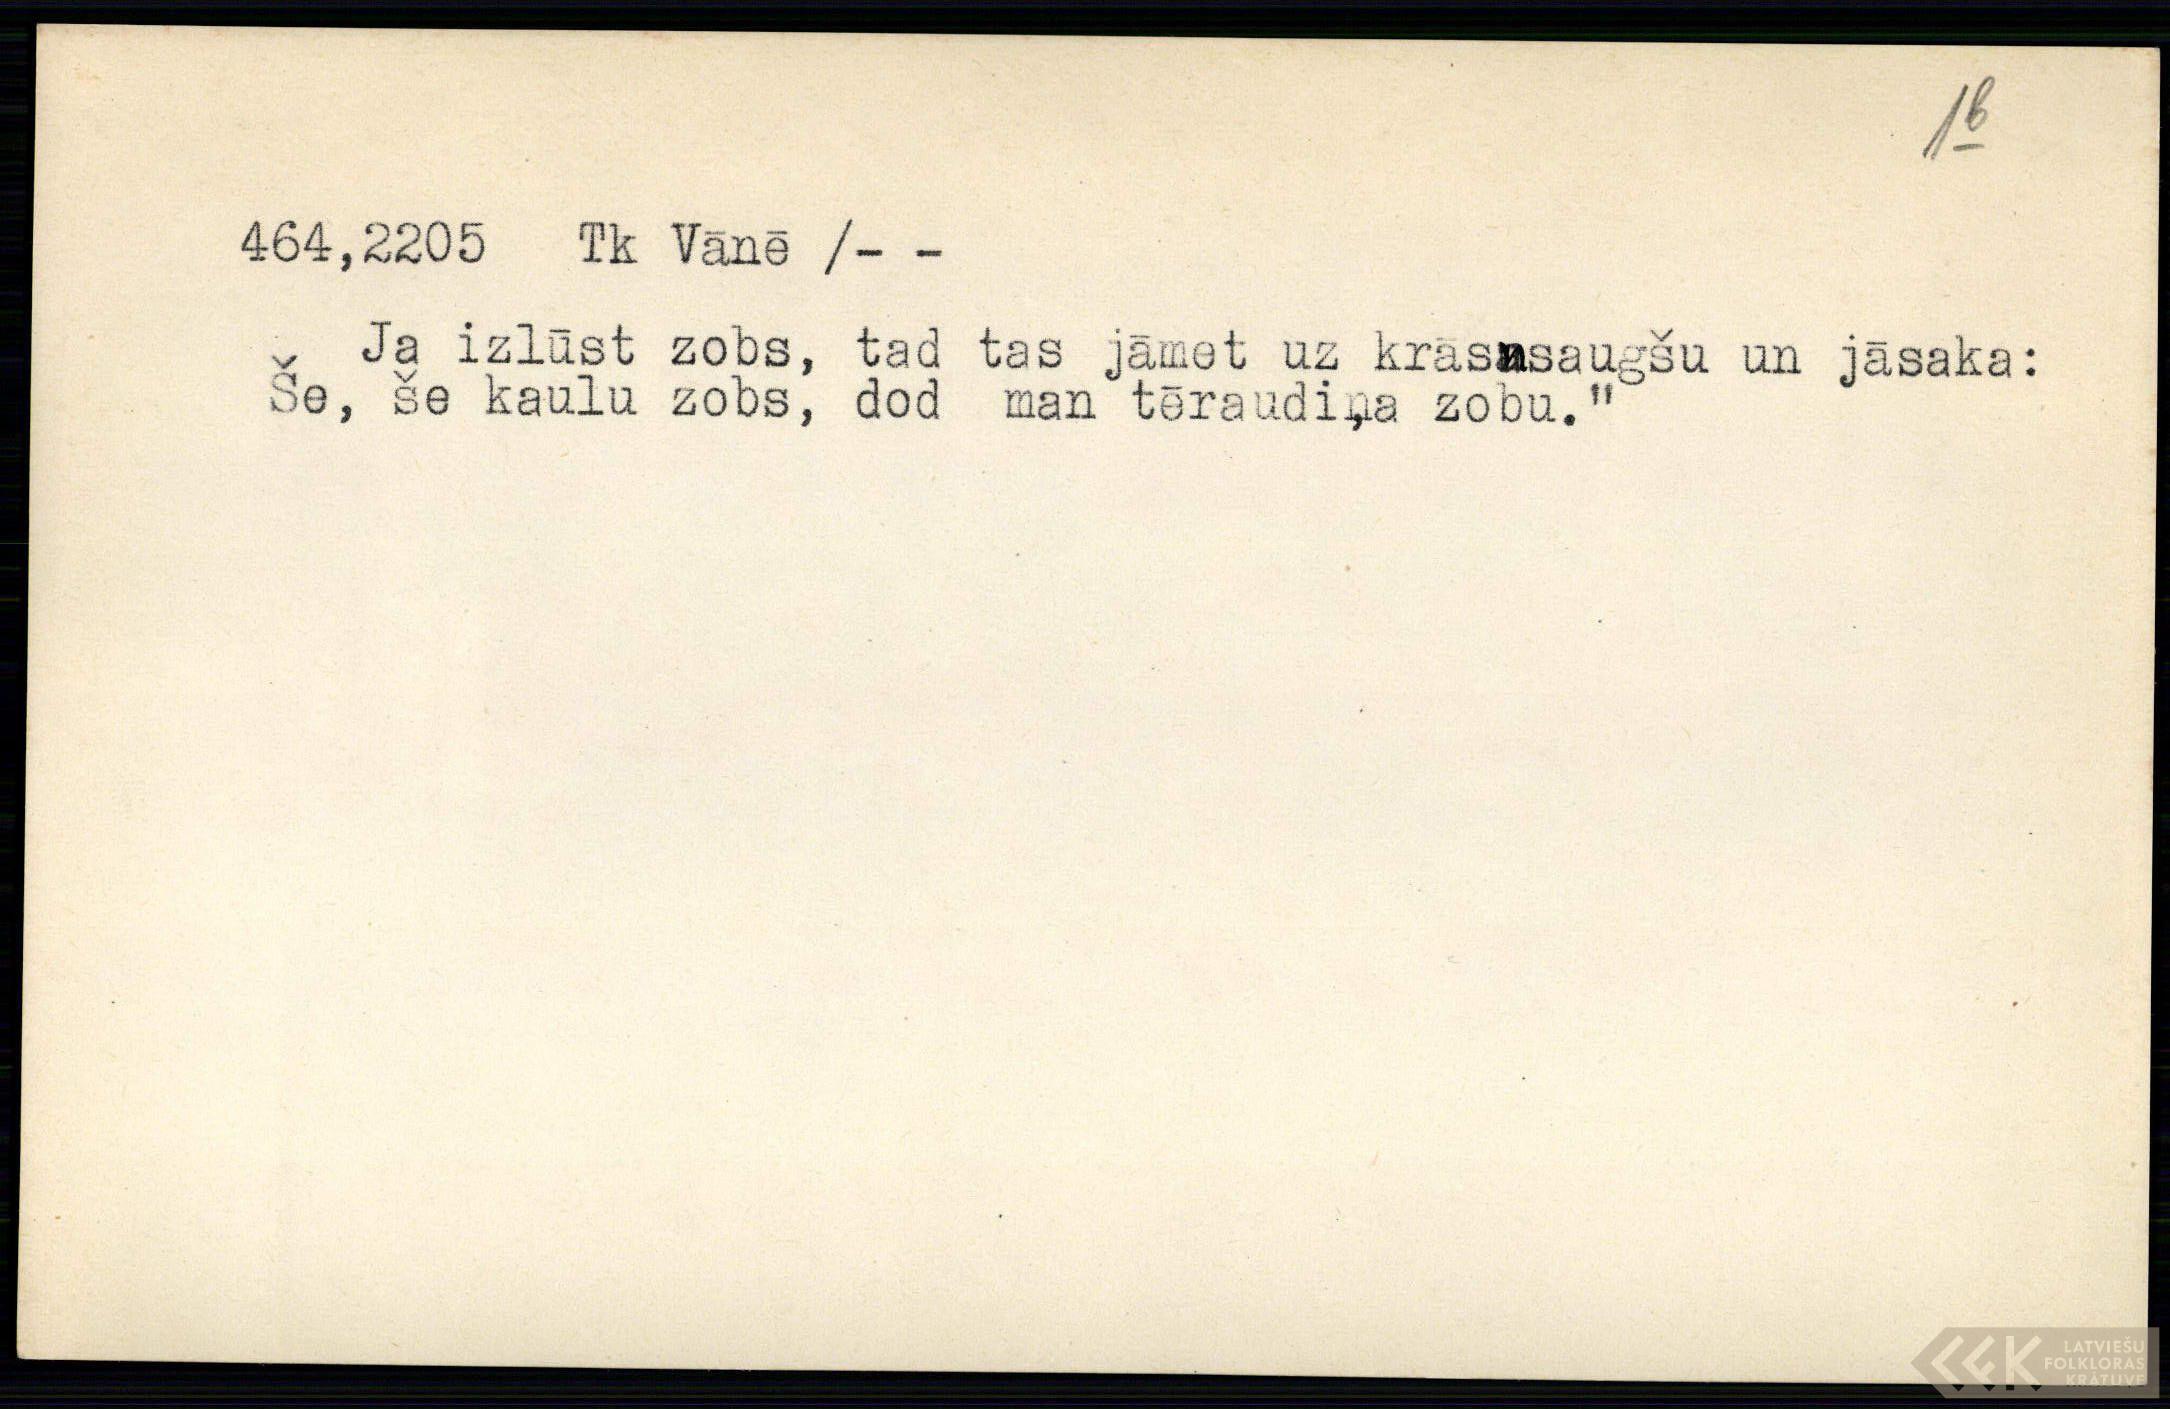 LFK-0464-02205-buramvardu-kartoteka